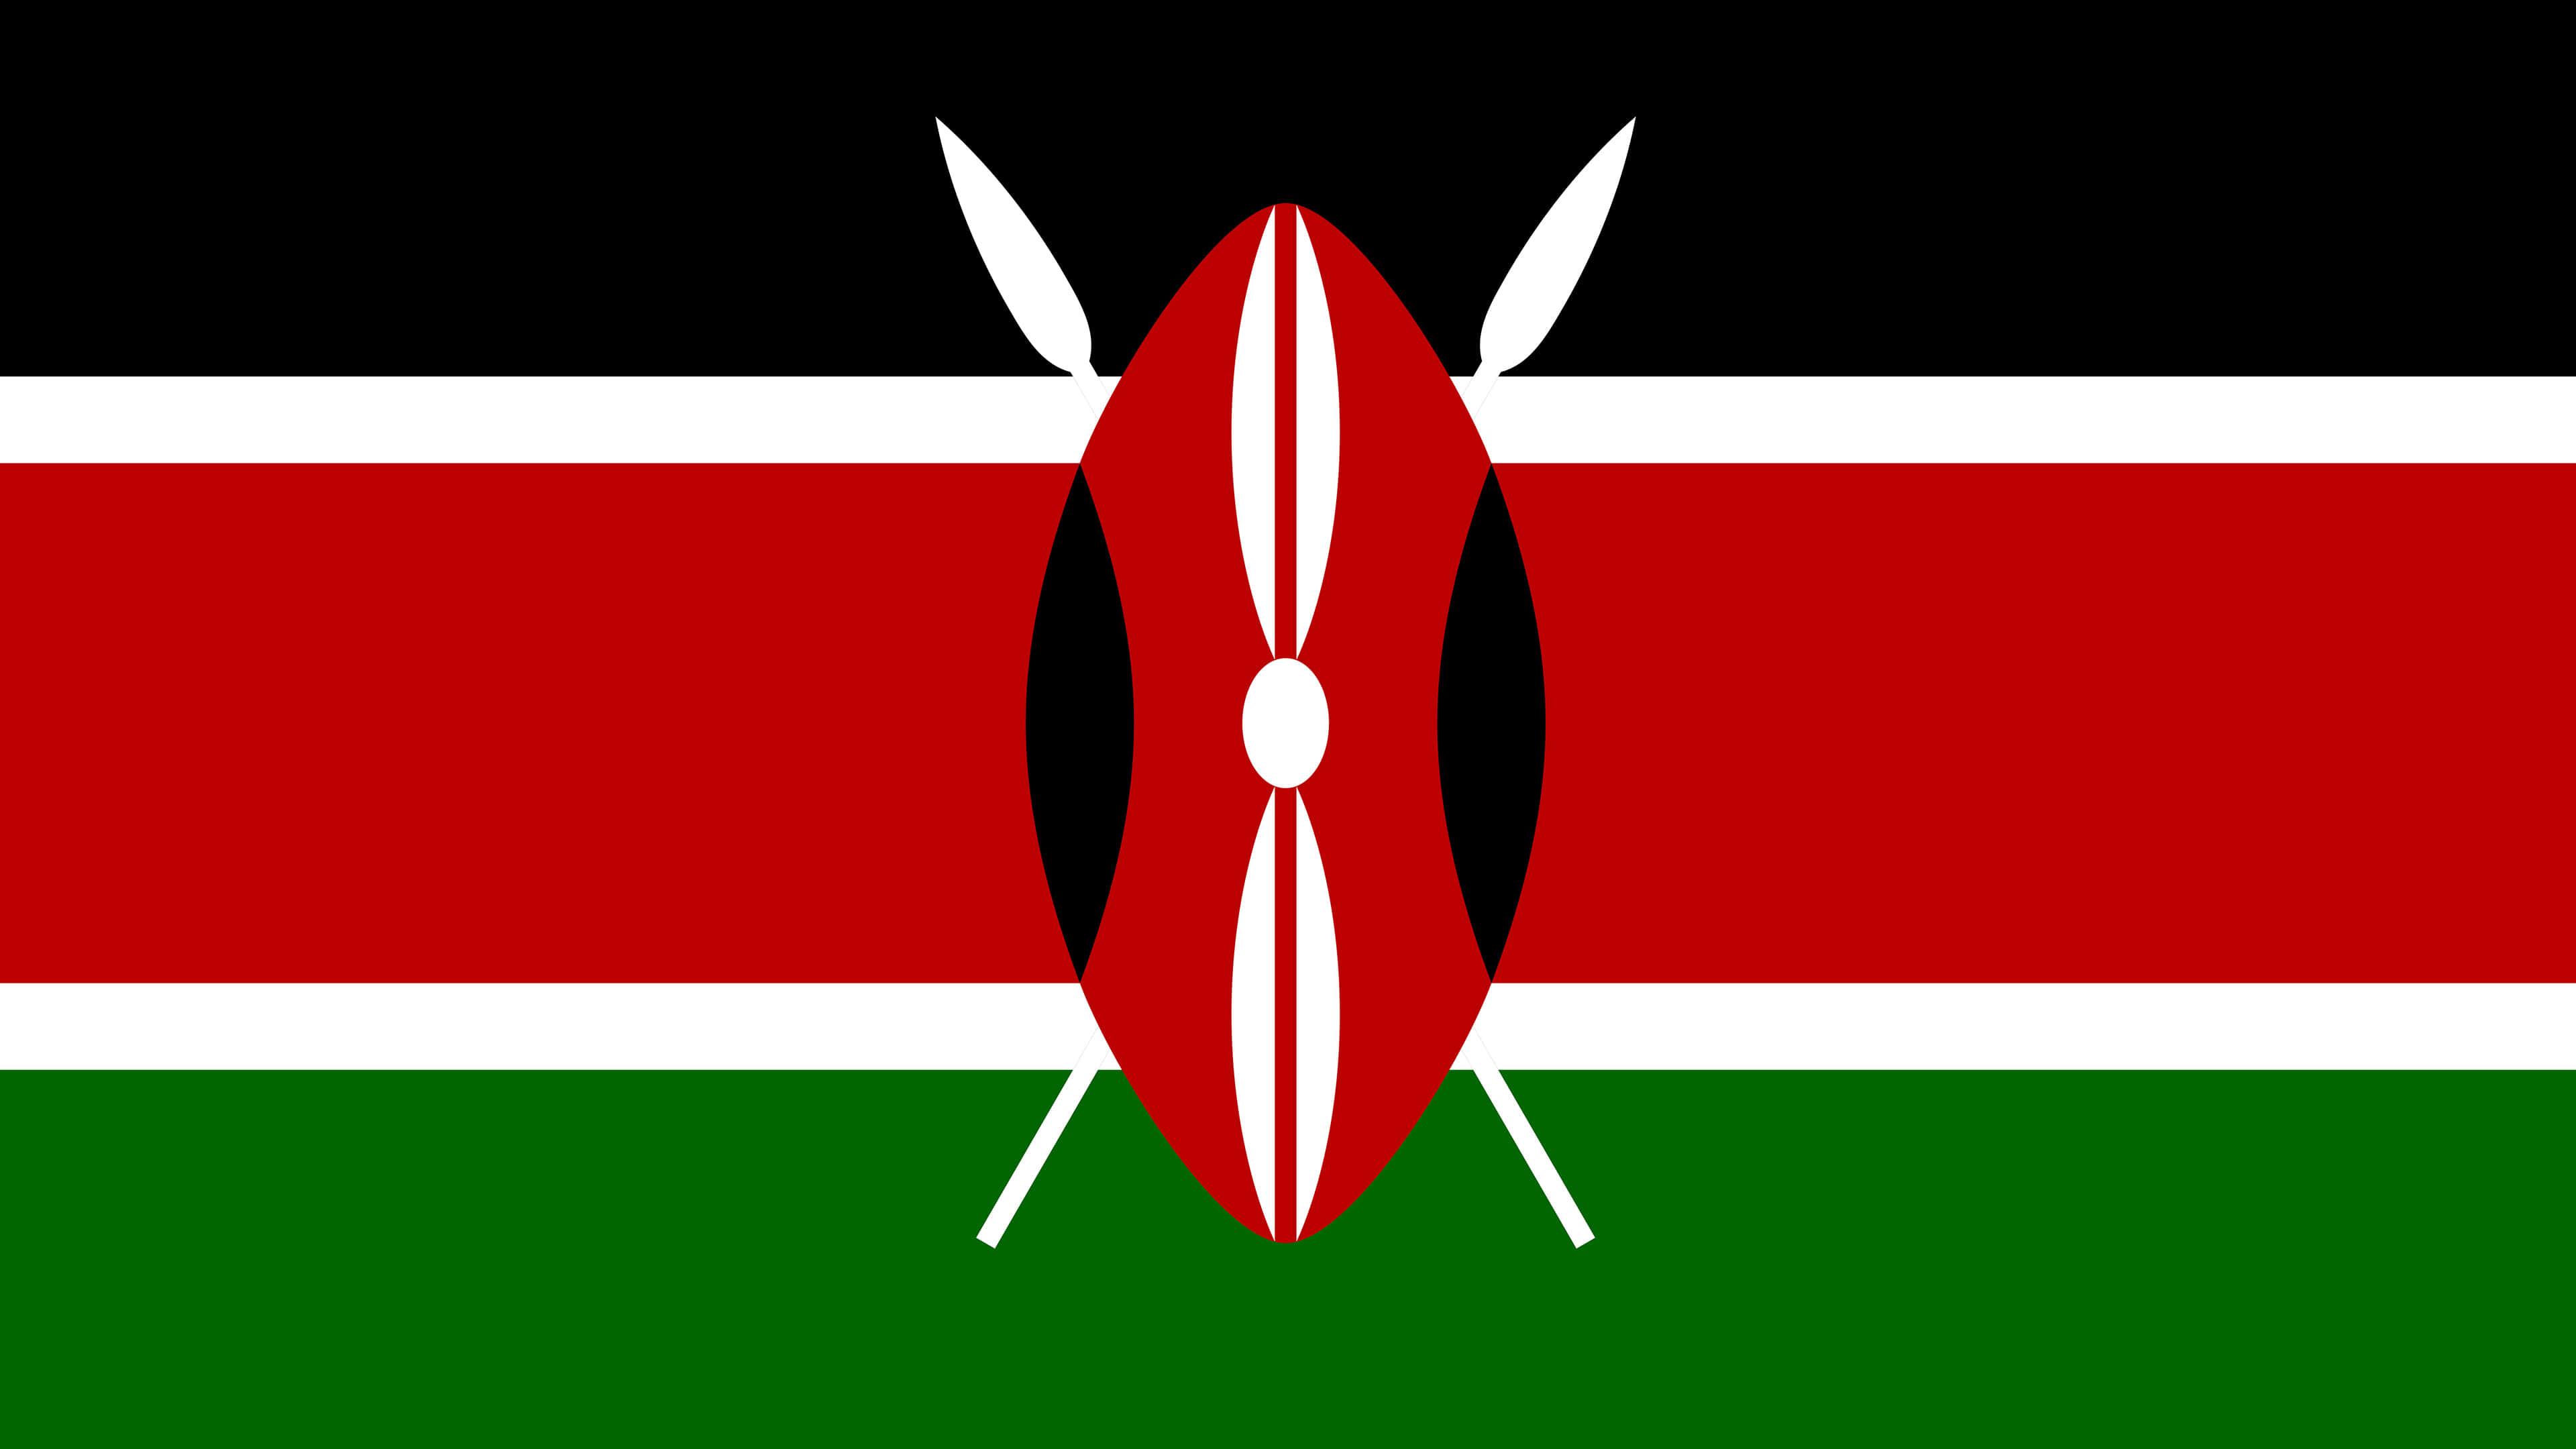 kenya flag uhd 4k wallpaper